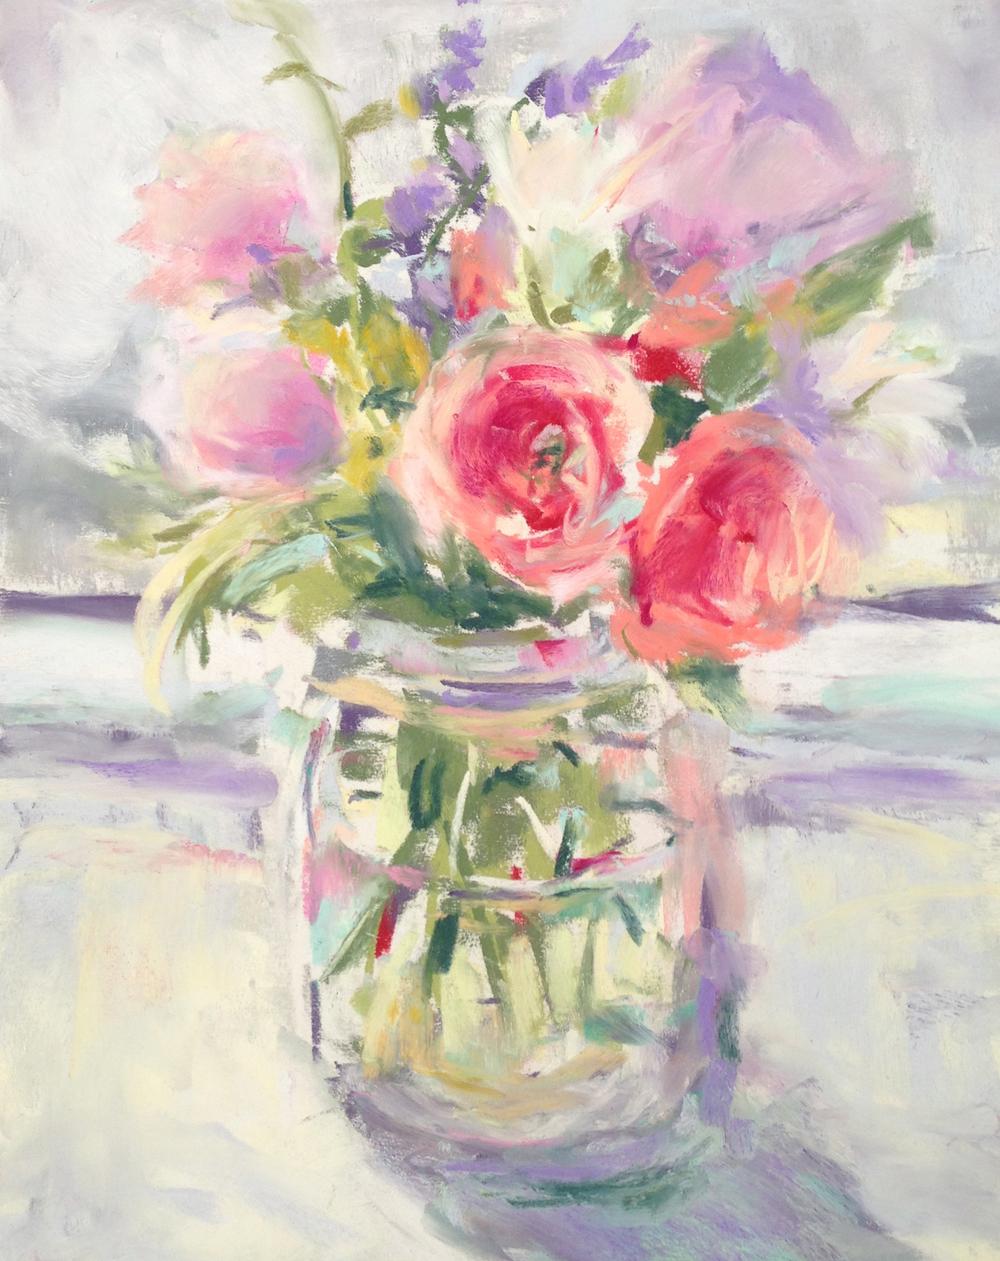 Little Bouquet  pastel on paper, 10x12. Available